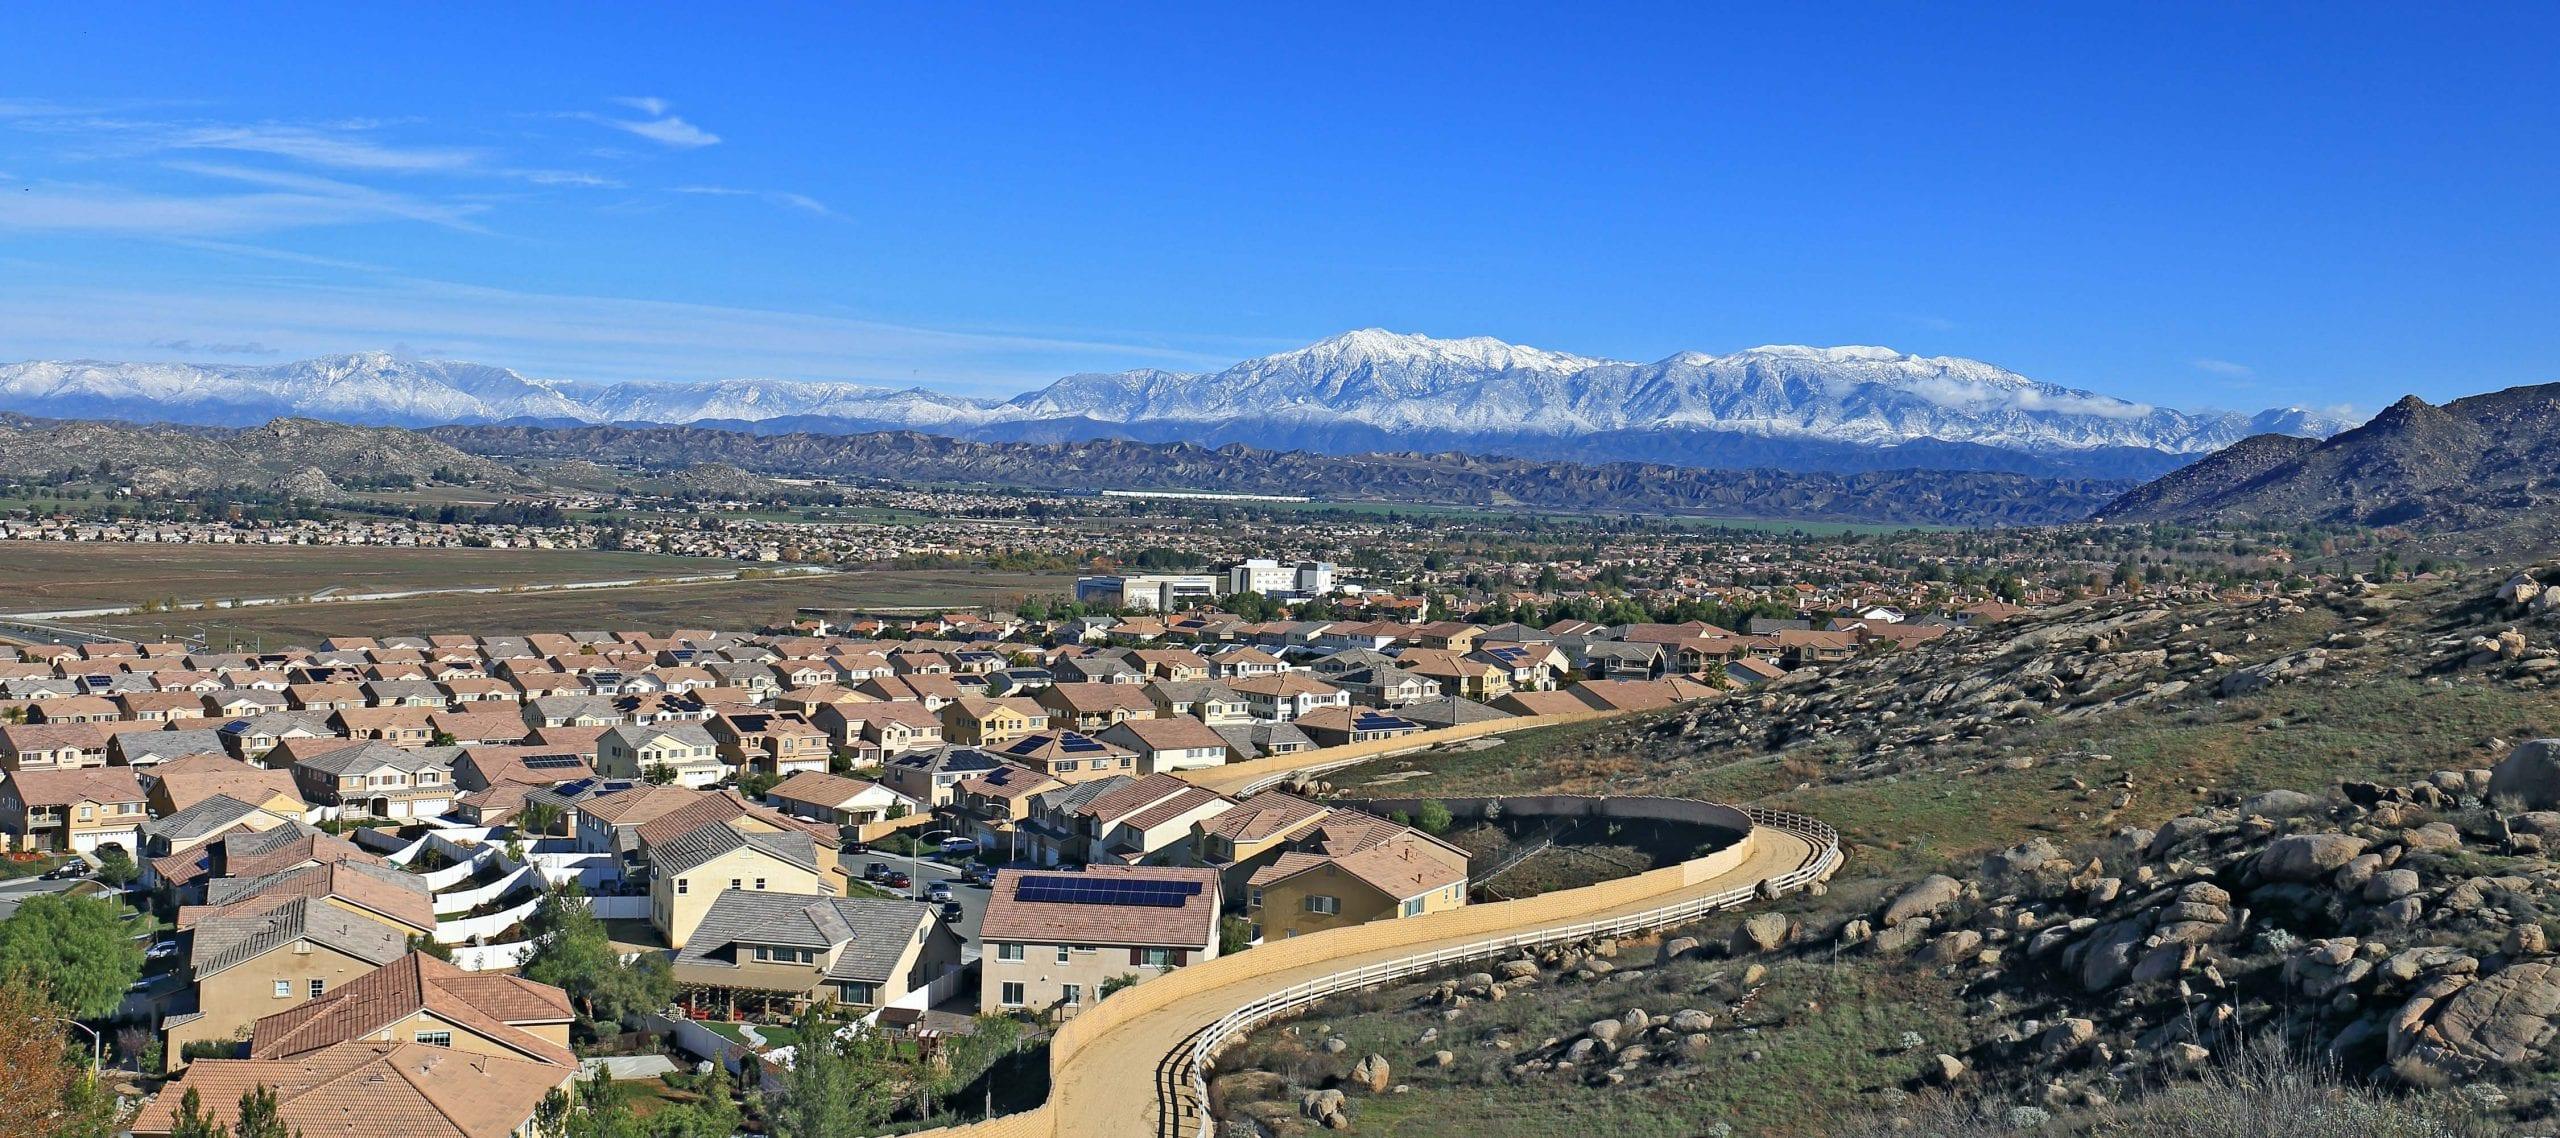 Bargain Dumpster Moreno Valley, CA